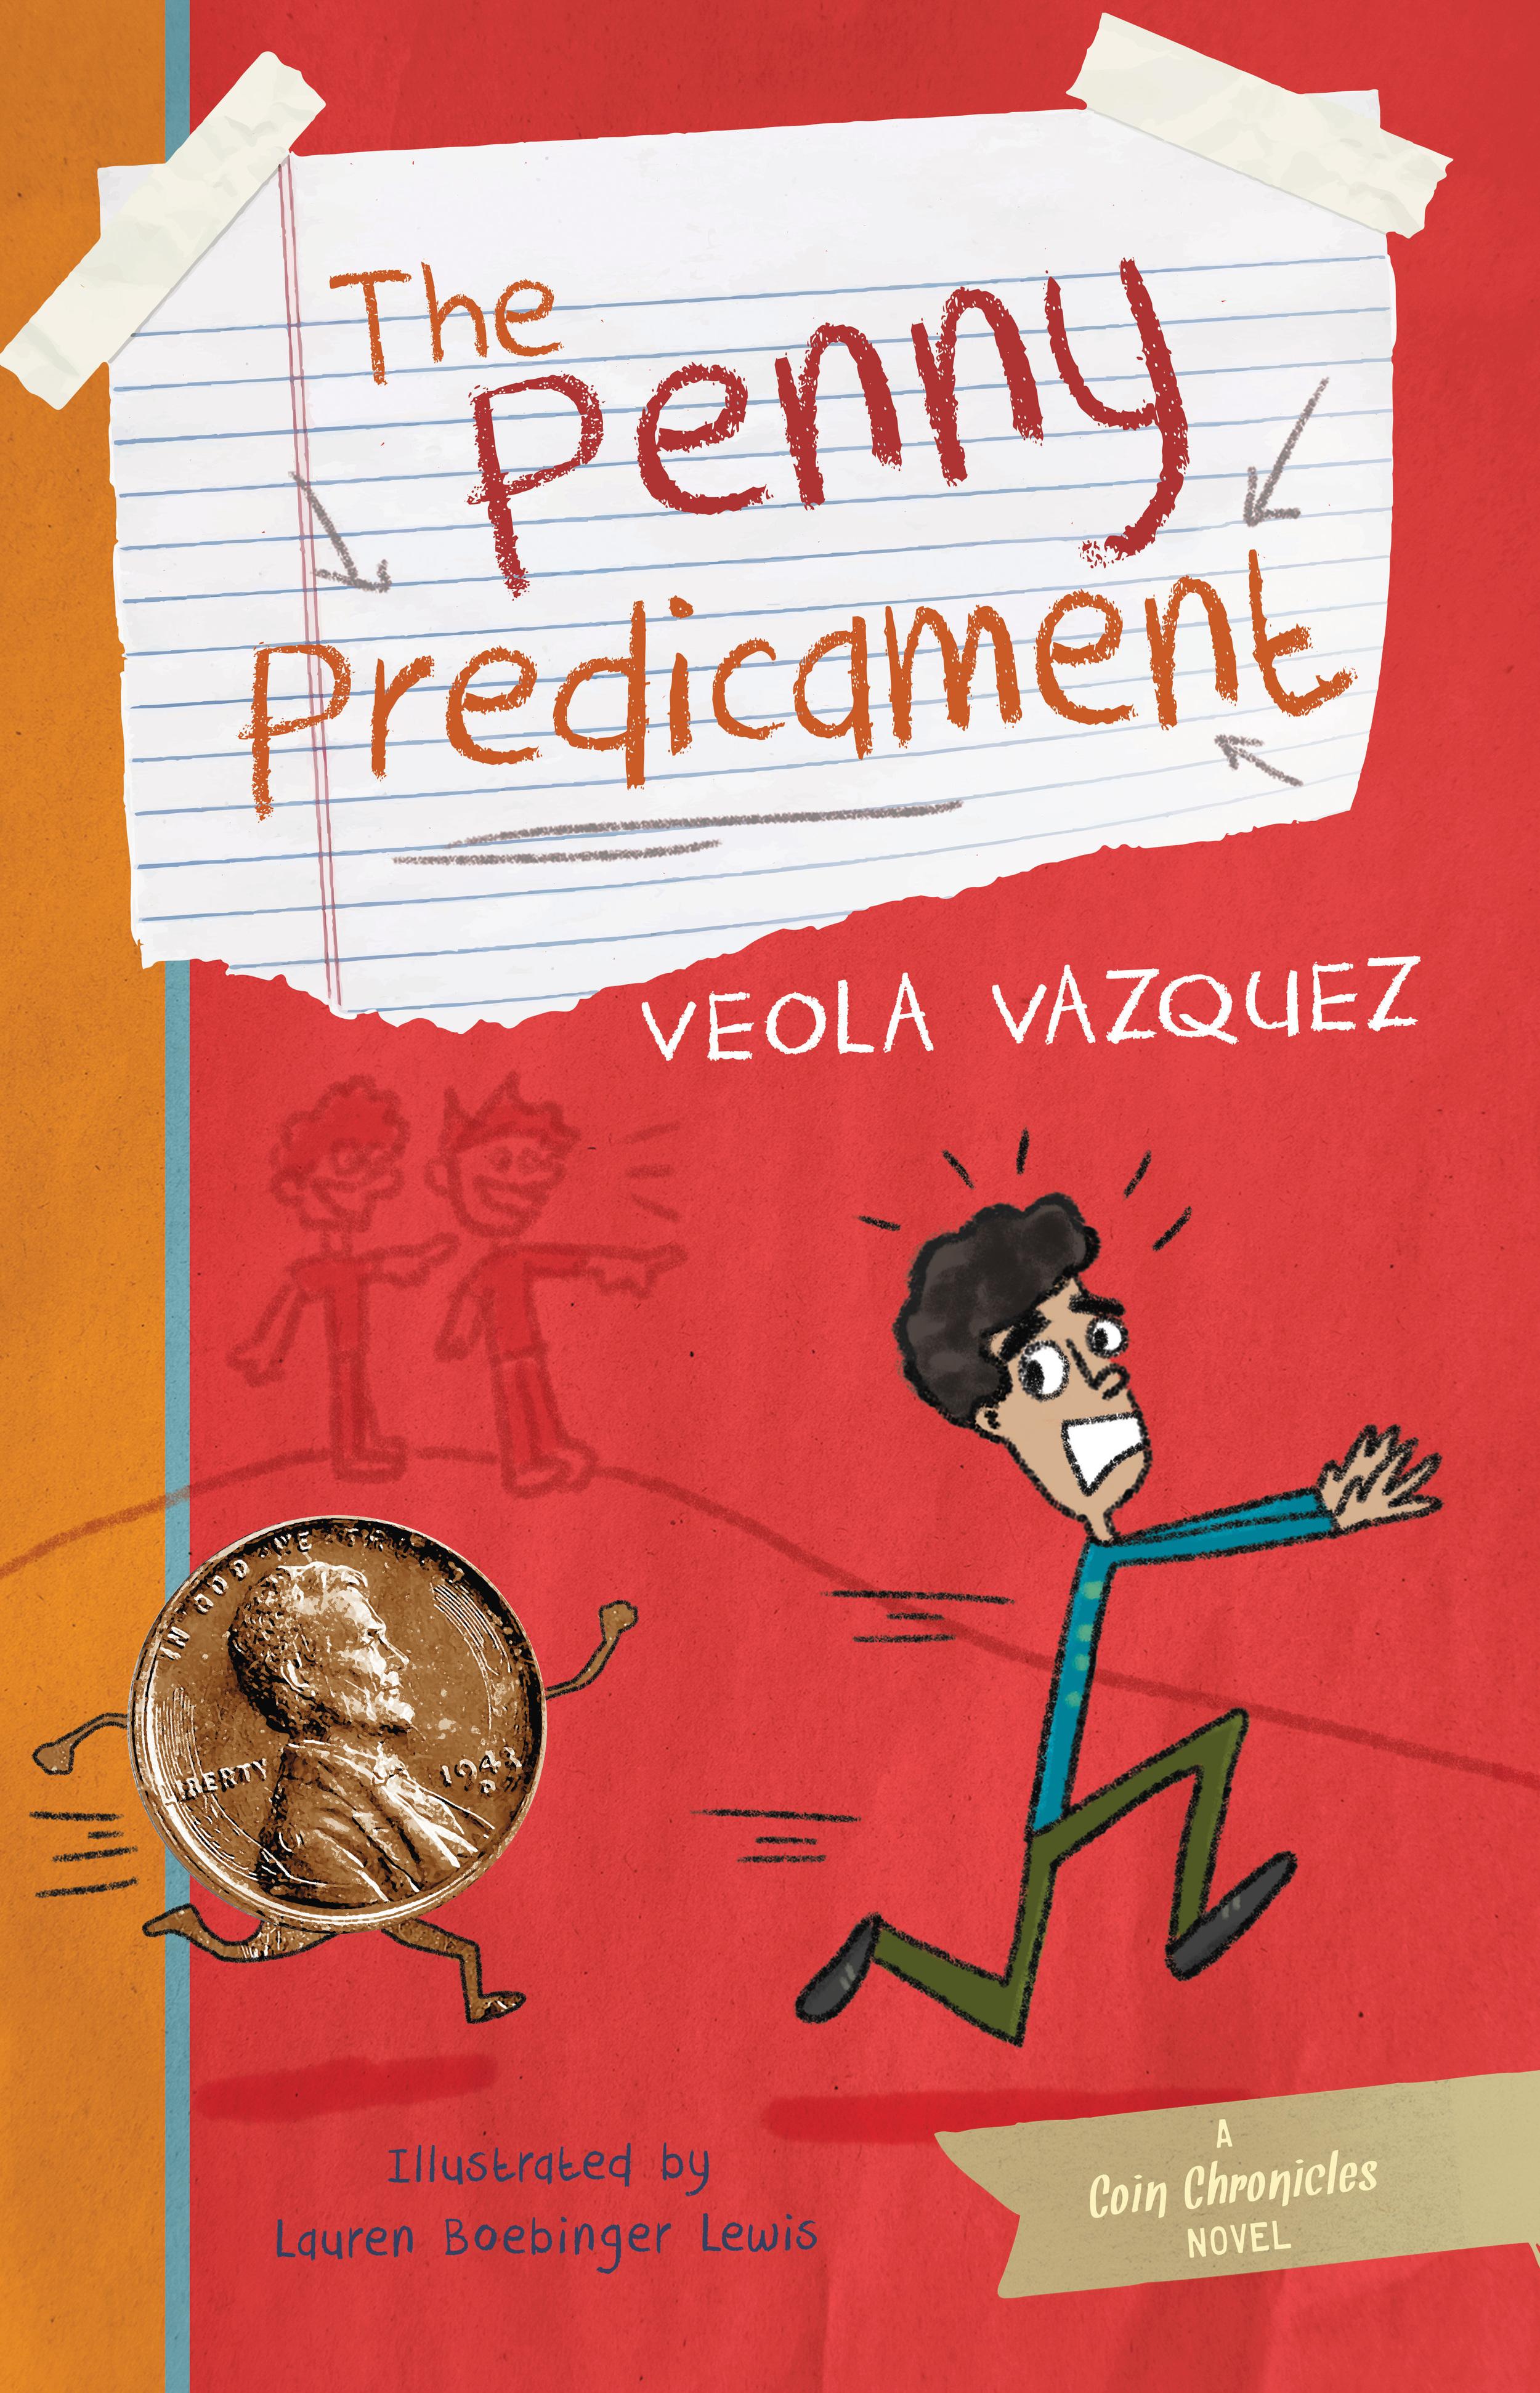 Written by Veola Vazquez, Ph.D. Illustrated by Lauren Boebinger Lewis